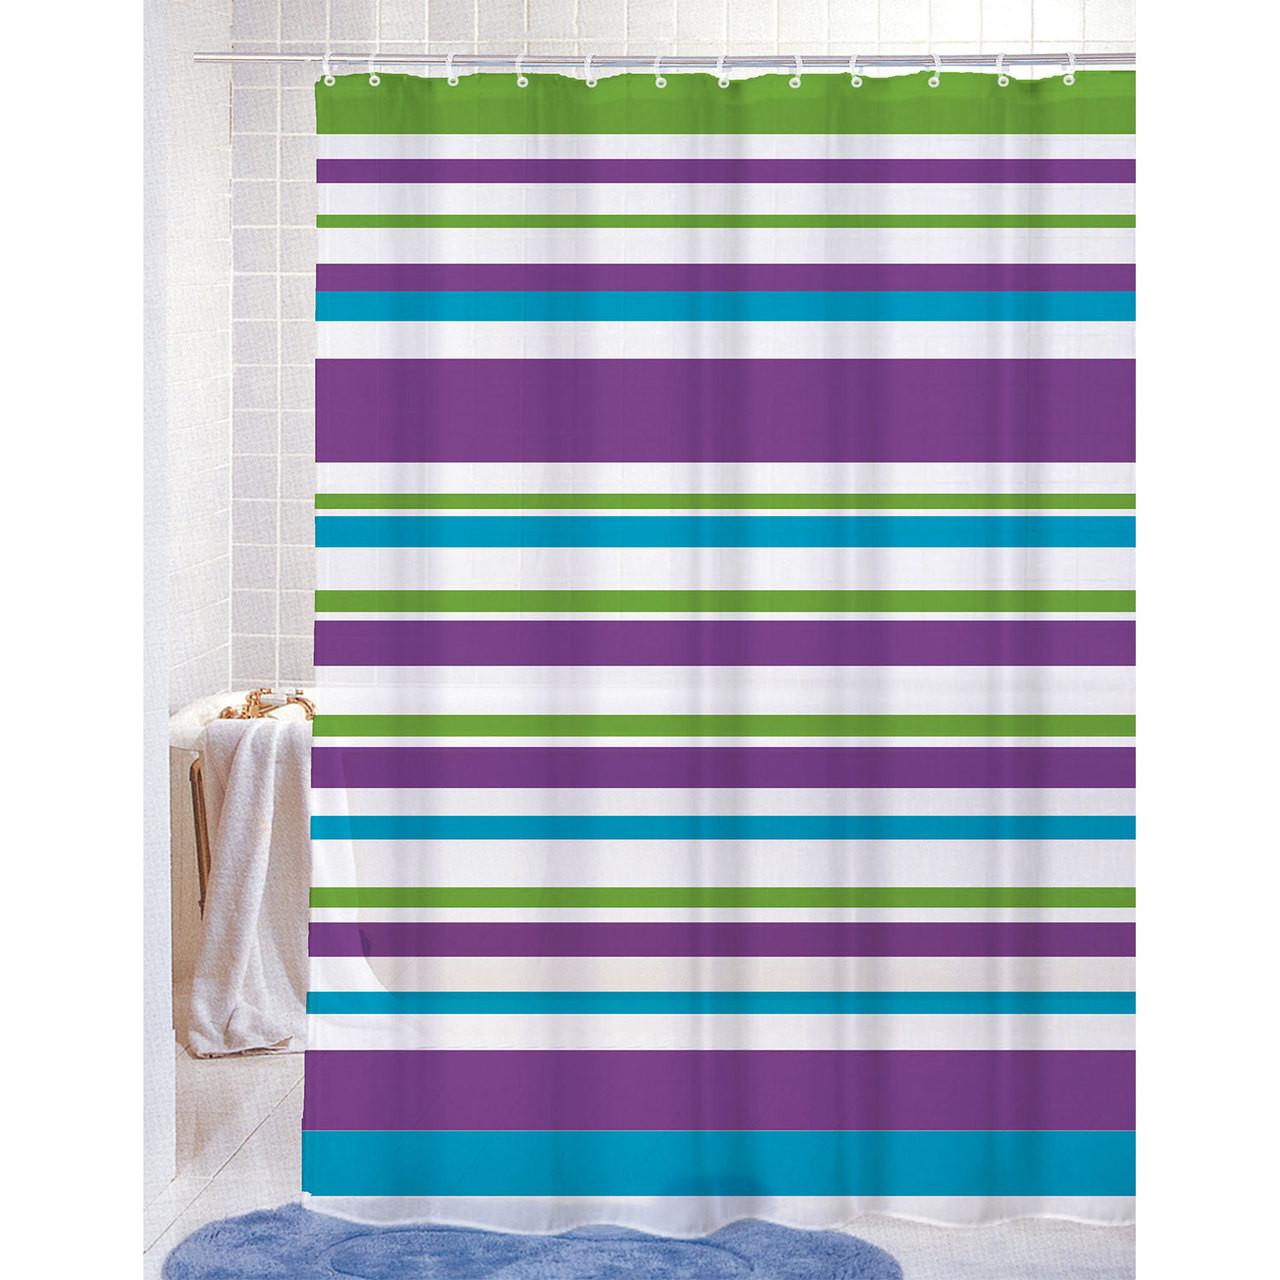 Pvc Free Peva Printed Shower Curtain Colorful Strata Stripes Print 70x72 Elyssa